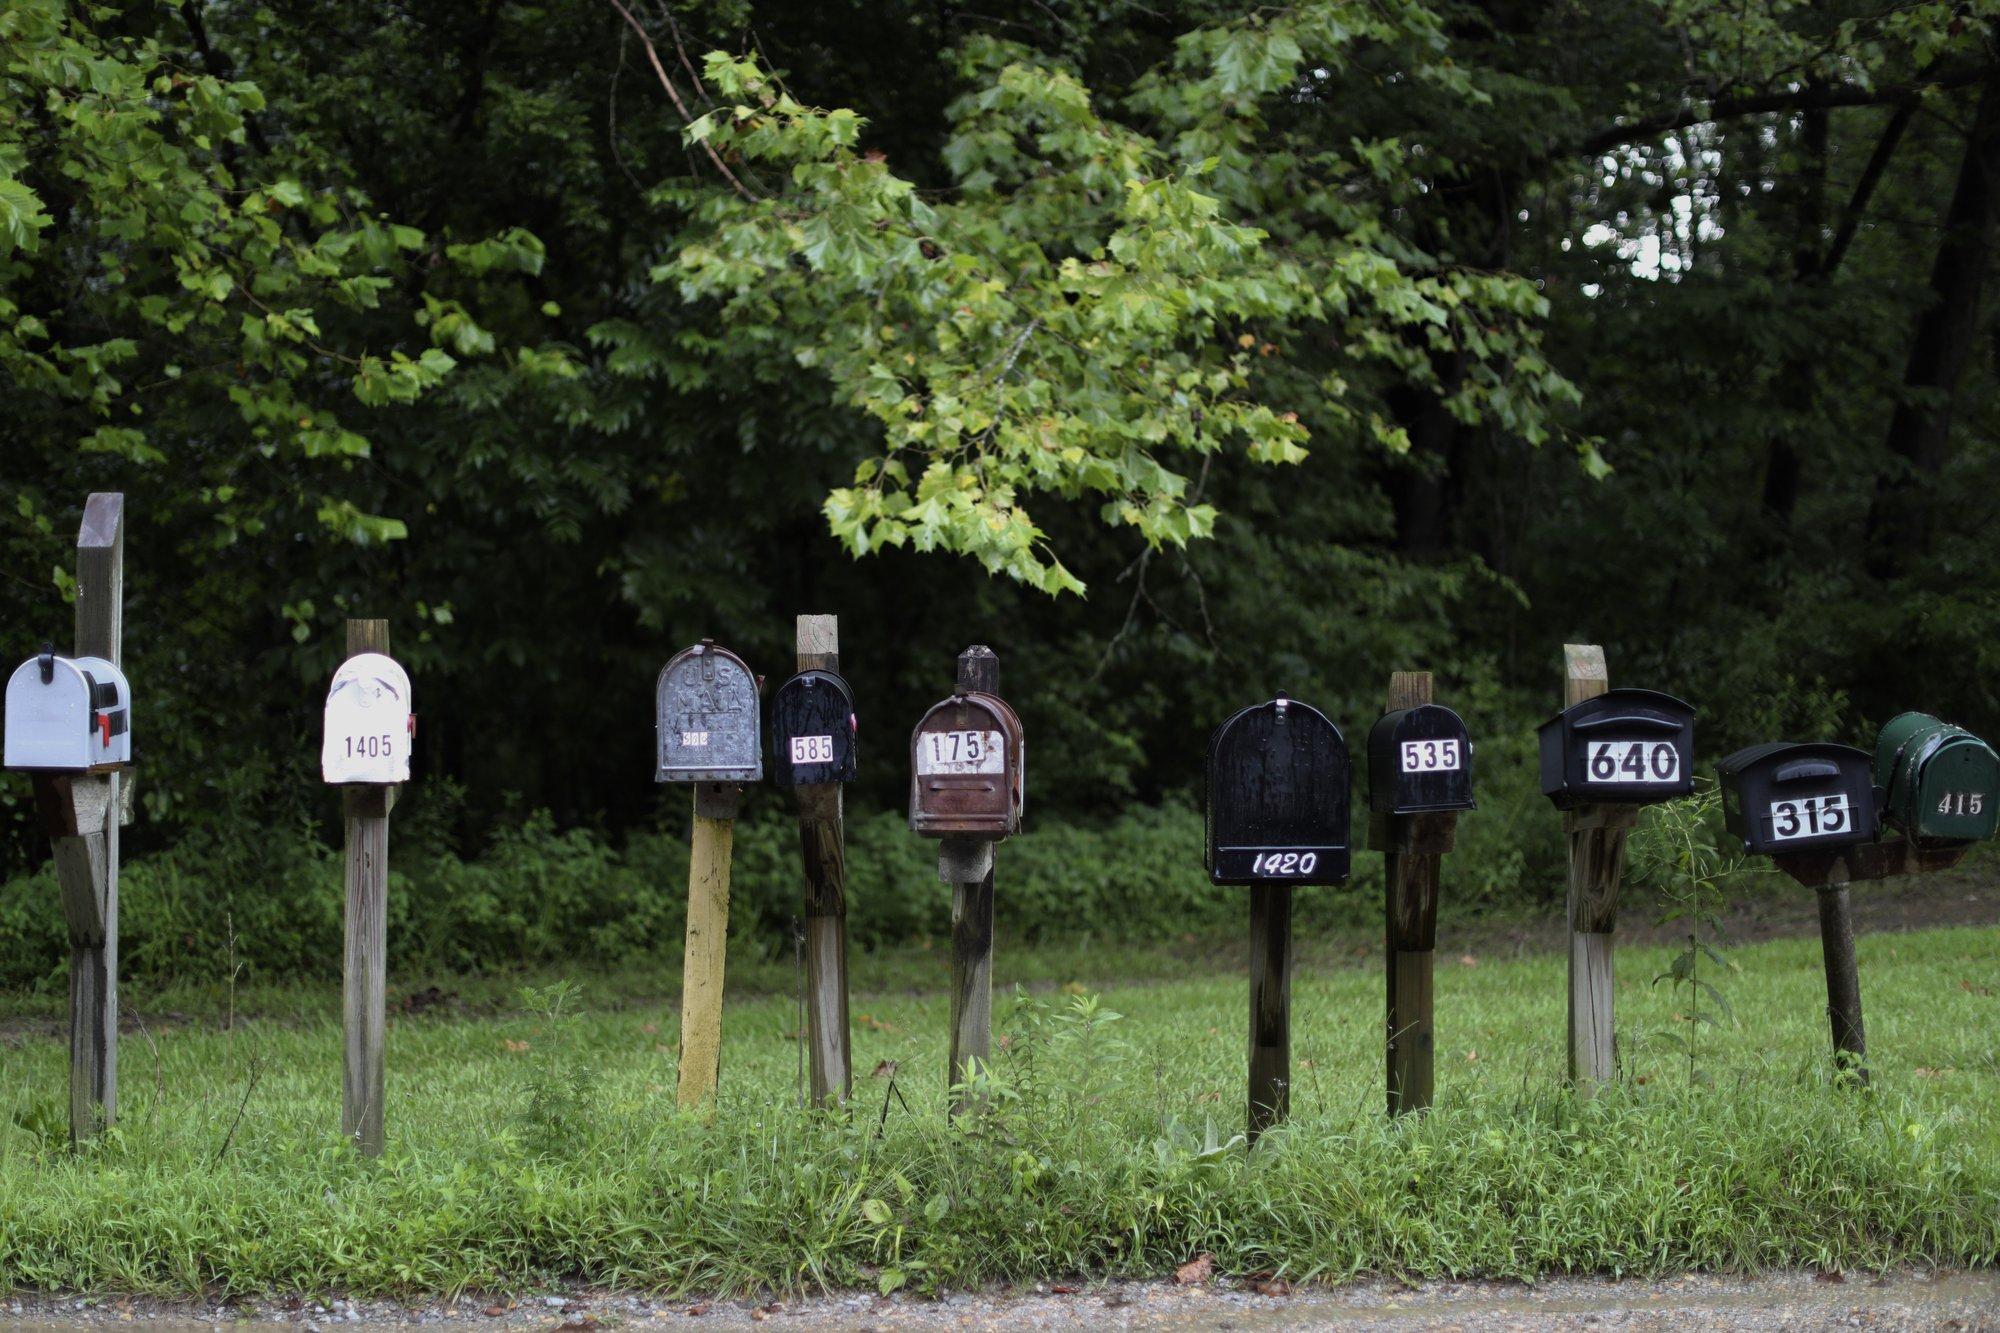 Mailboxes line a street in Jonesboro, Ill., on Sunday, Aug. 2, 2020. (AP Photo/Wong Maye-E)